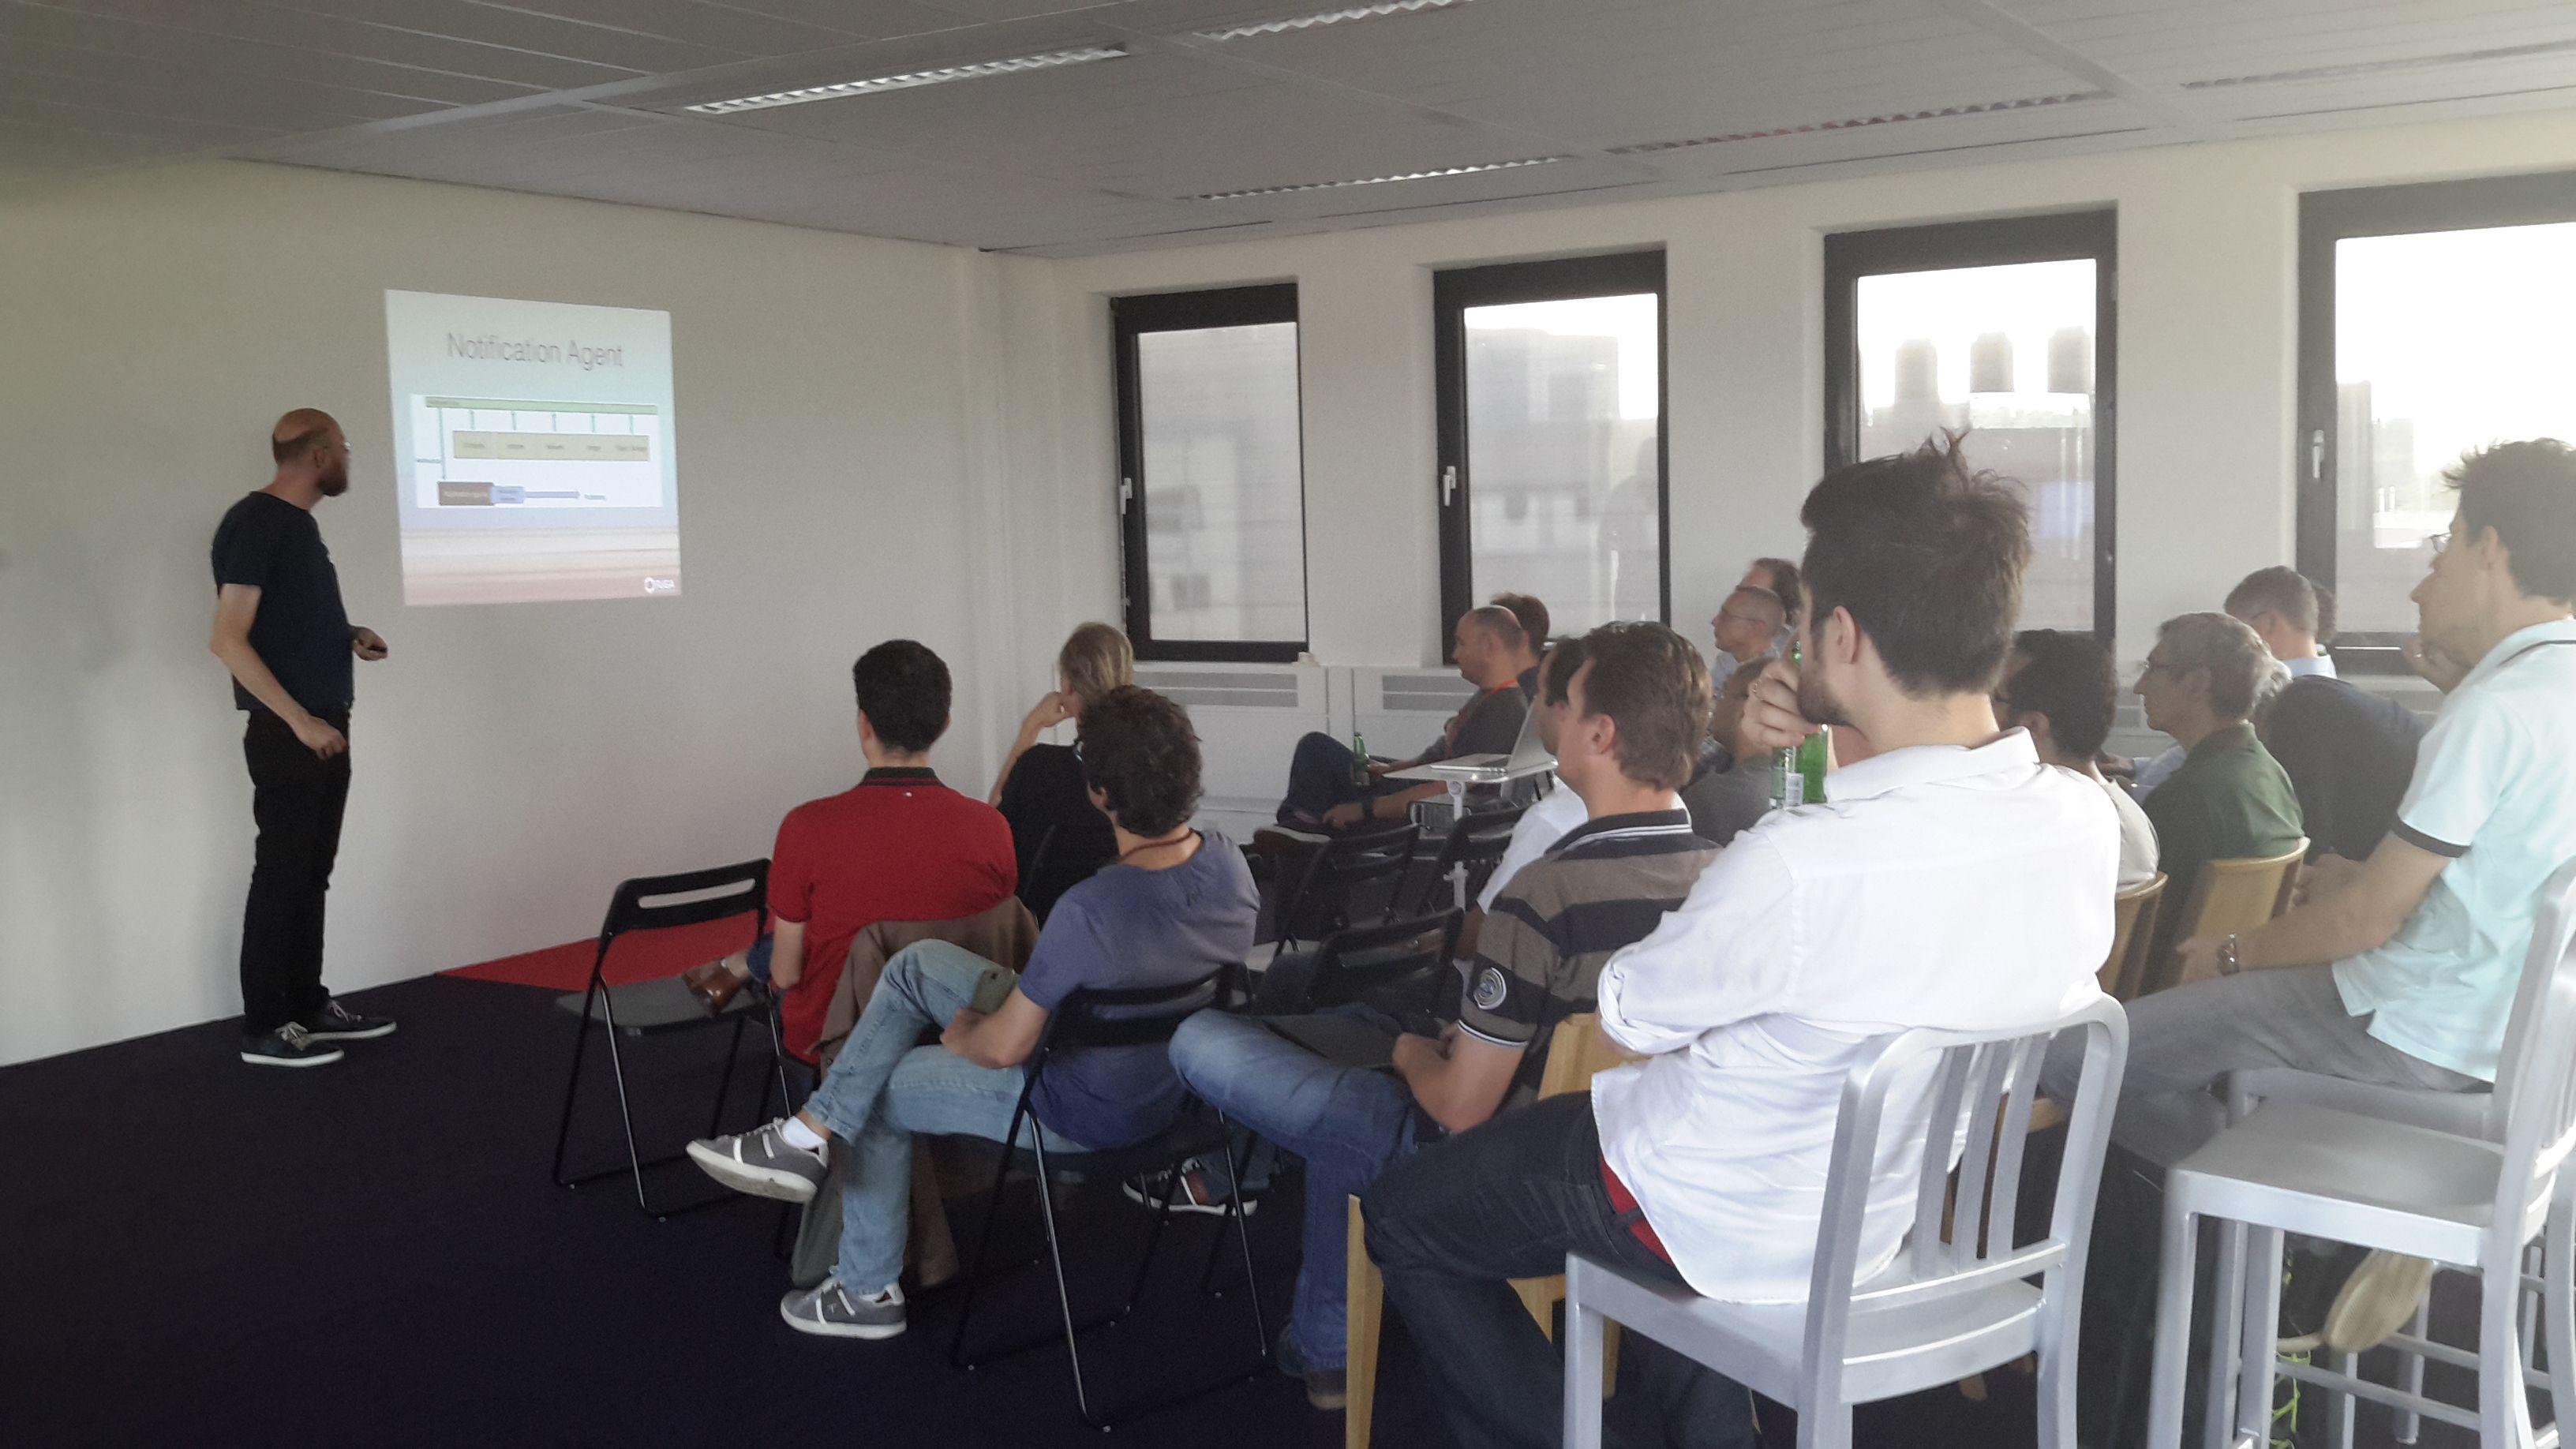 Openstack & Ceph User Group Amsterdam